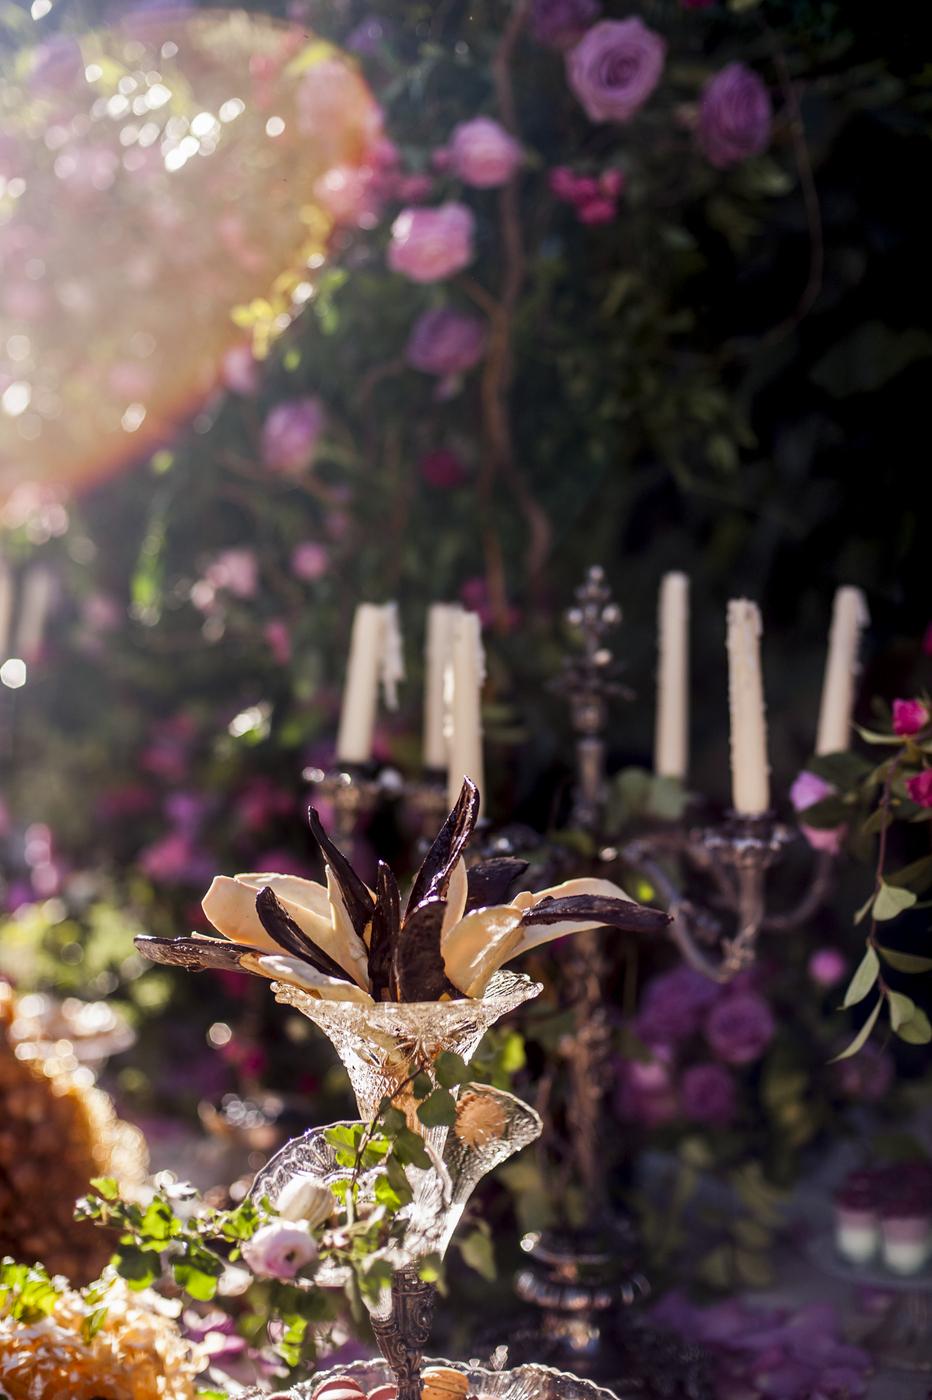 calista-one-lista-de-bodas-online-blog-de-bodas-inpisracion-bodas-la-boda-sonada-18-copia